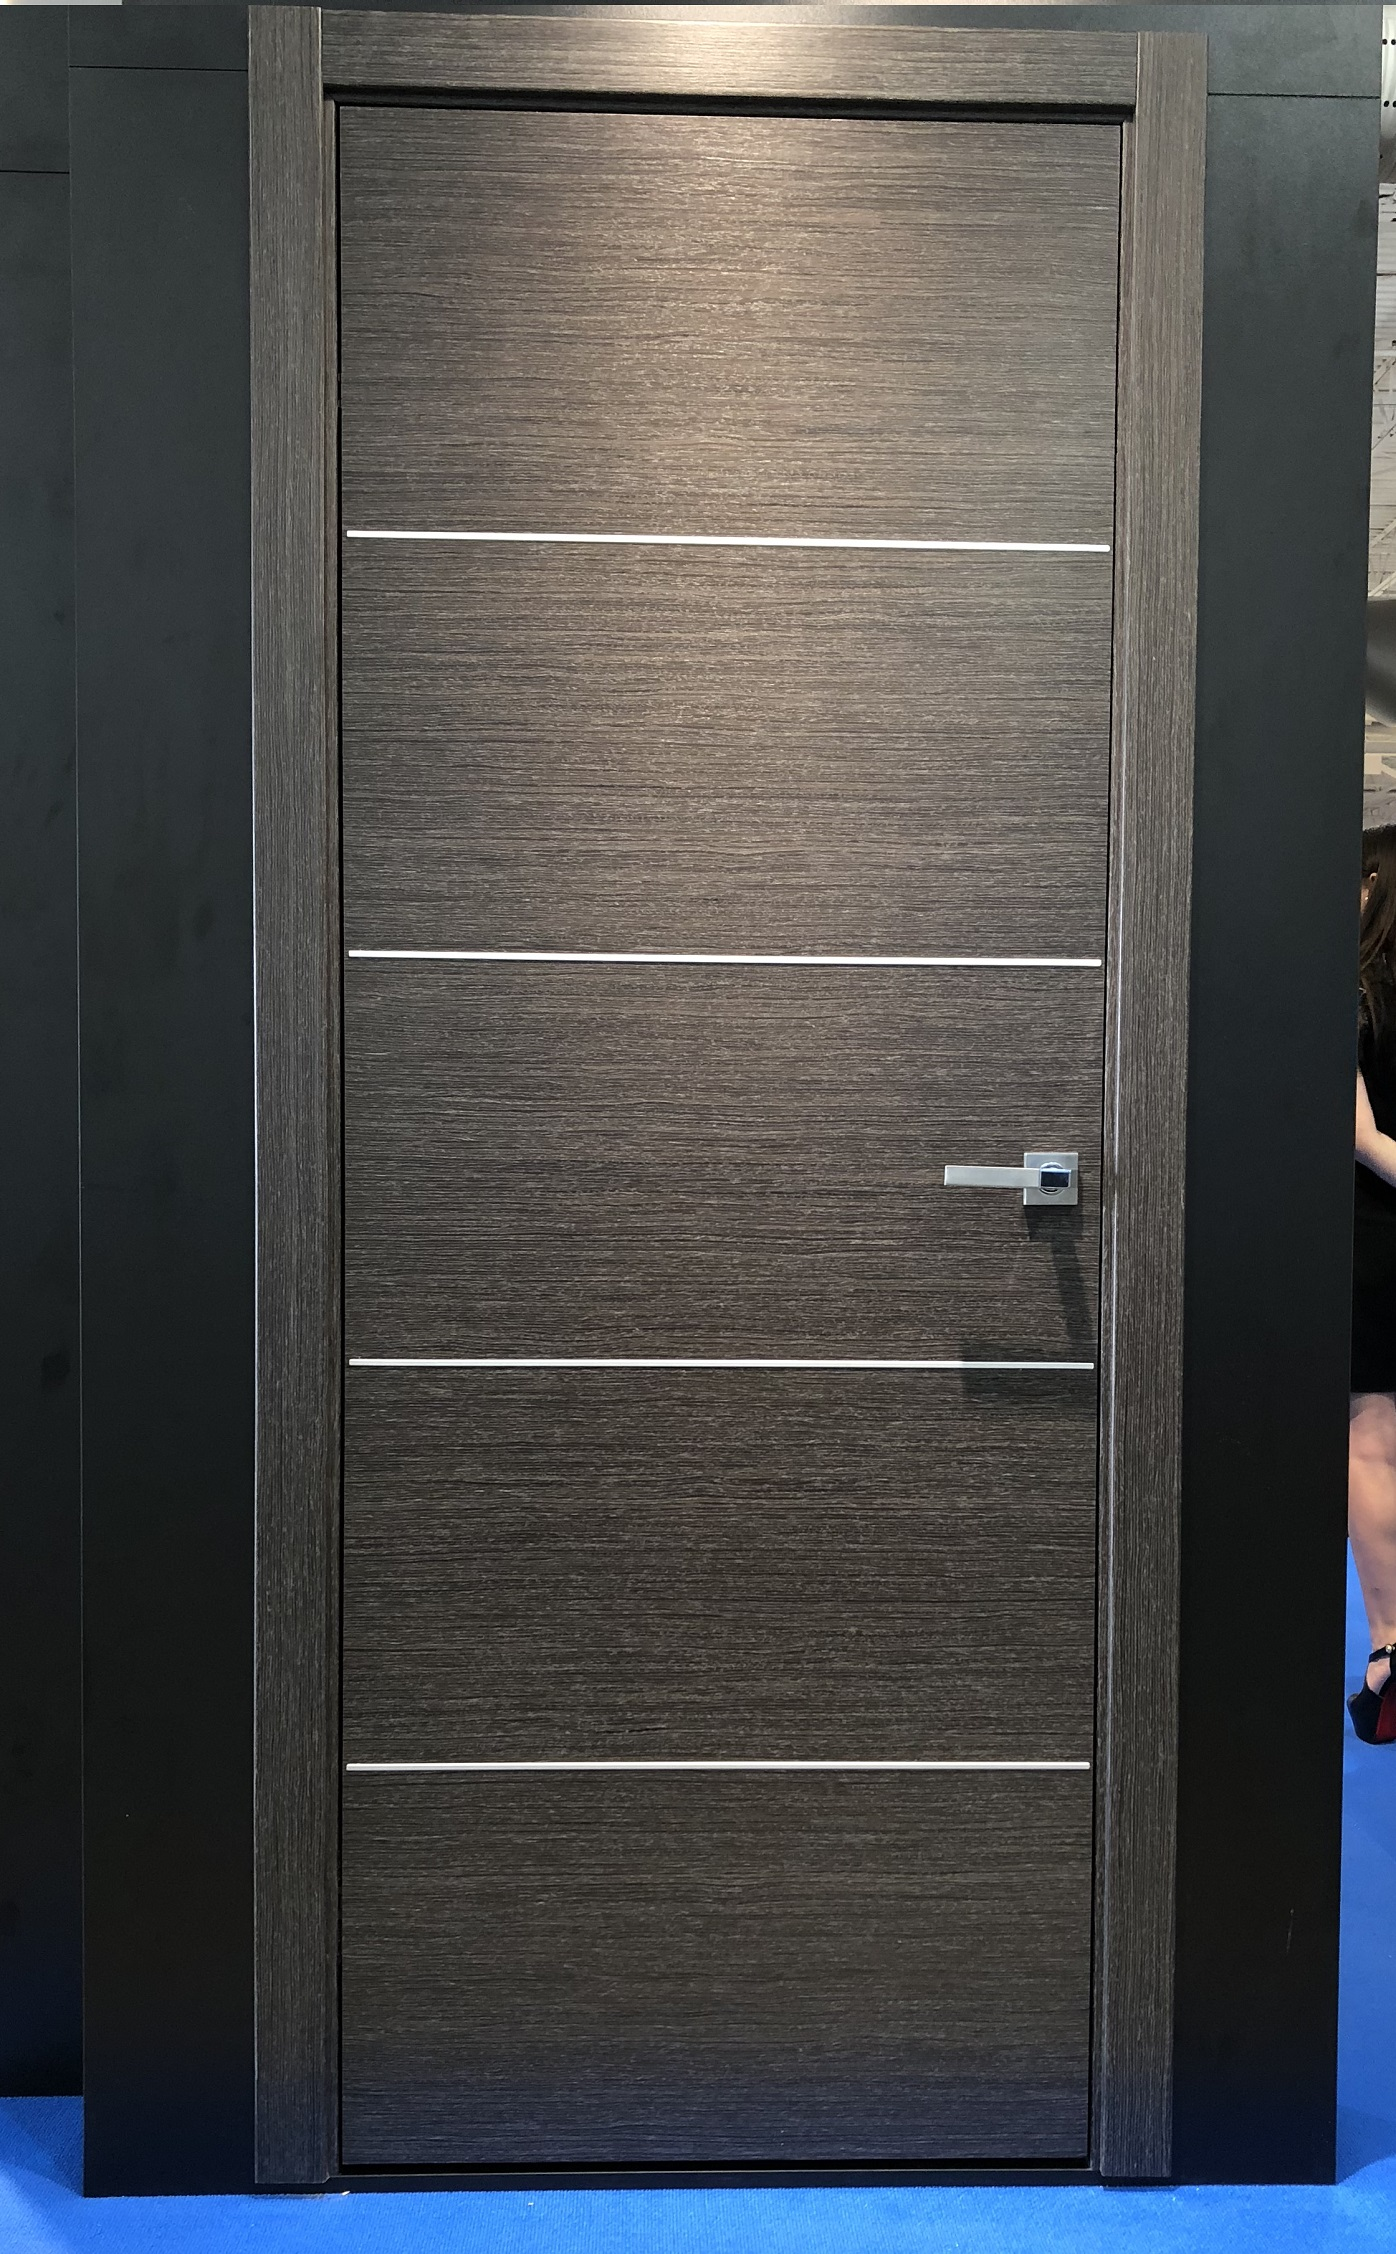 Image Versa Interior Door Black Apricot 3